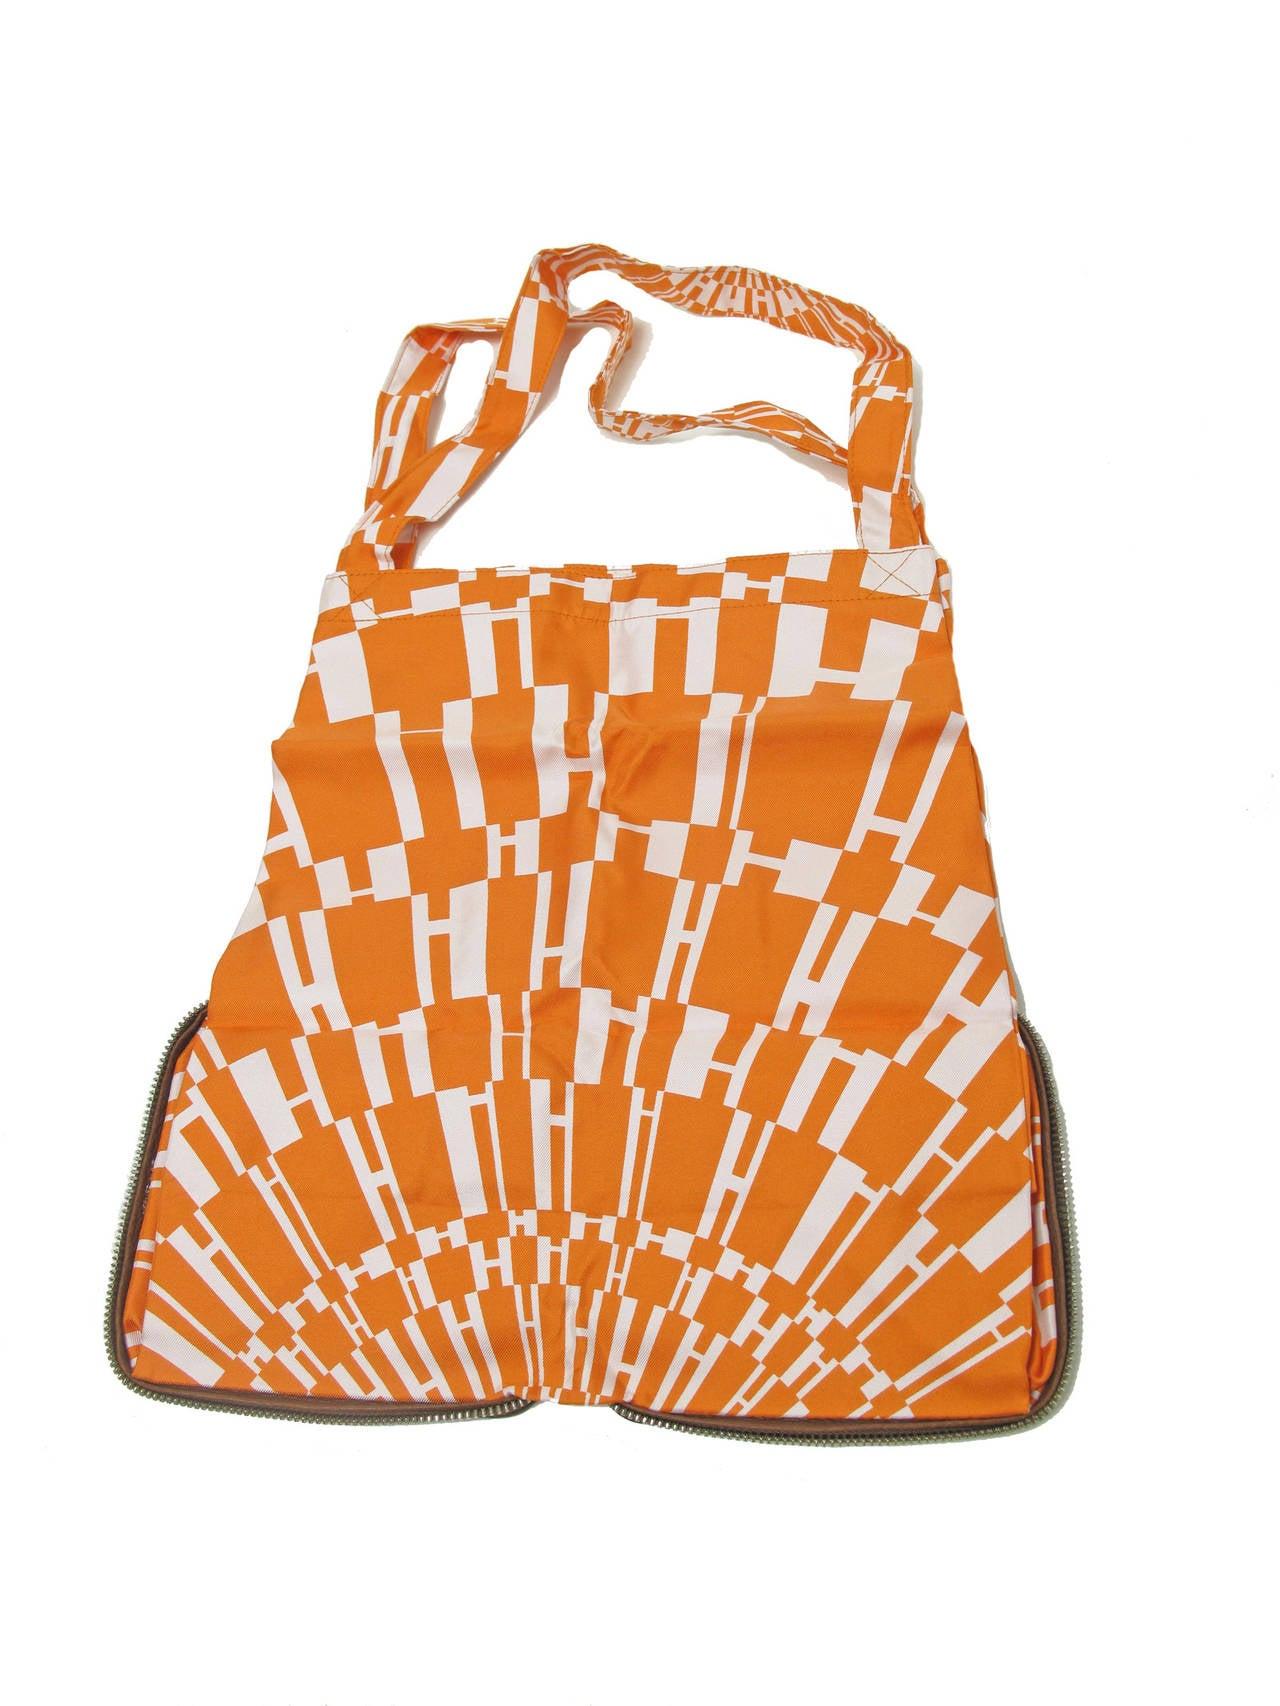 Rare Hermes Orange H Shopper Tote Collapsible Zip Handbag - sale 4